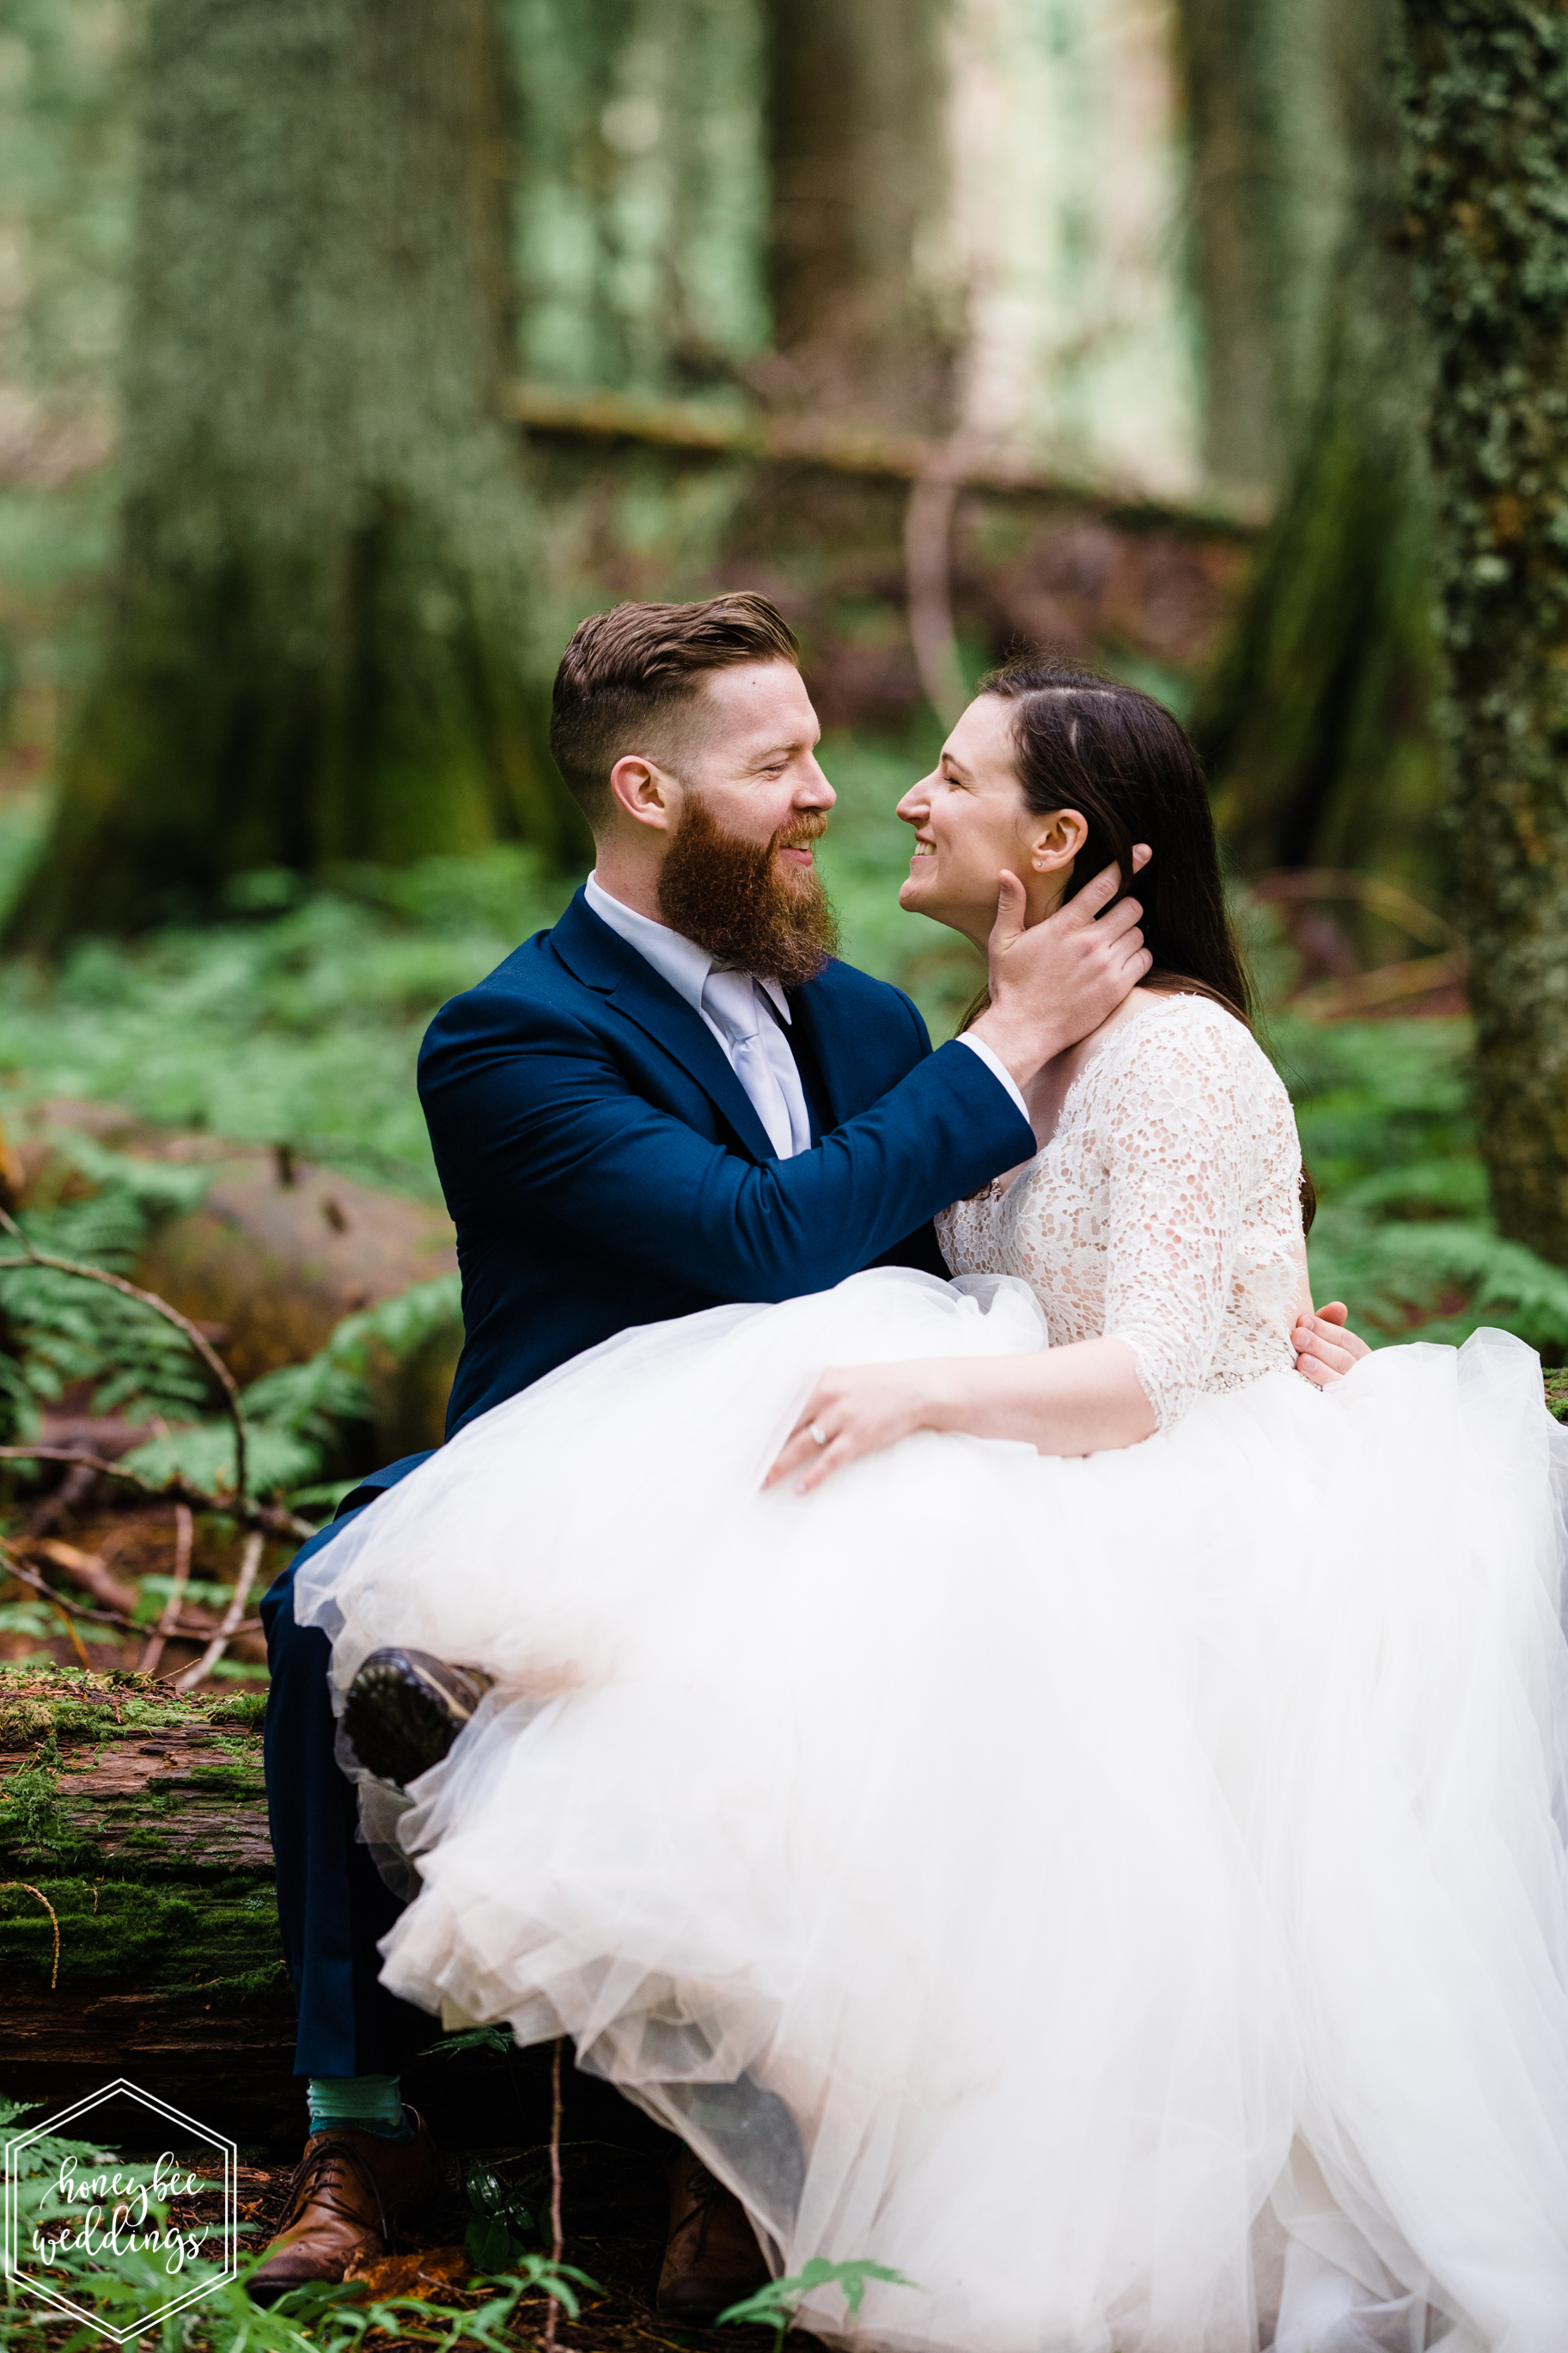 338Glacier National Park Wedding_Izaak Walton Inn Wedding_Honeybee Weddings_Norah & Kyle_June 09, 2019-174.jpg